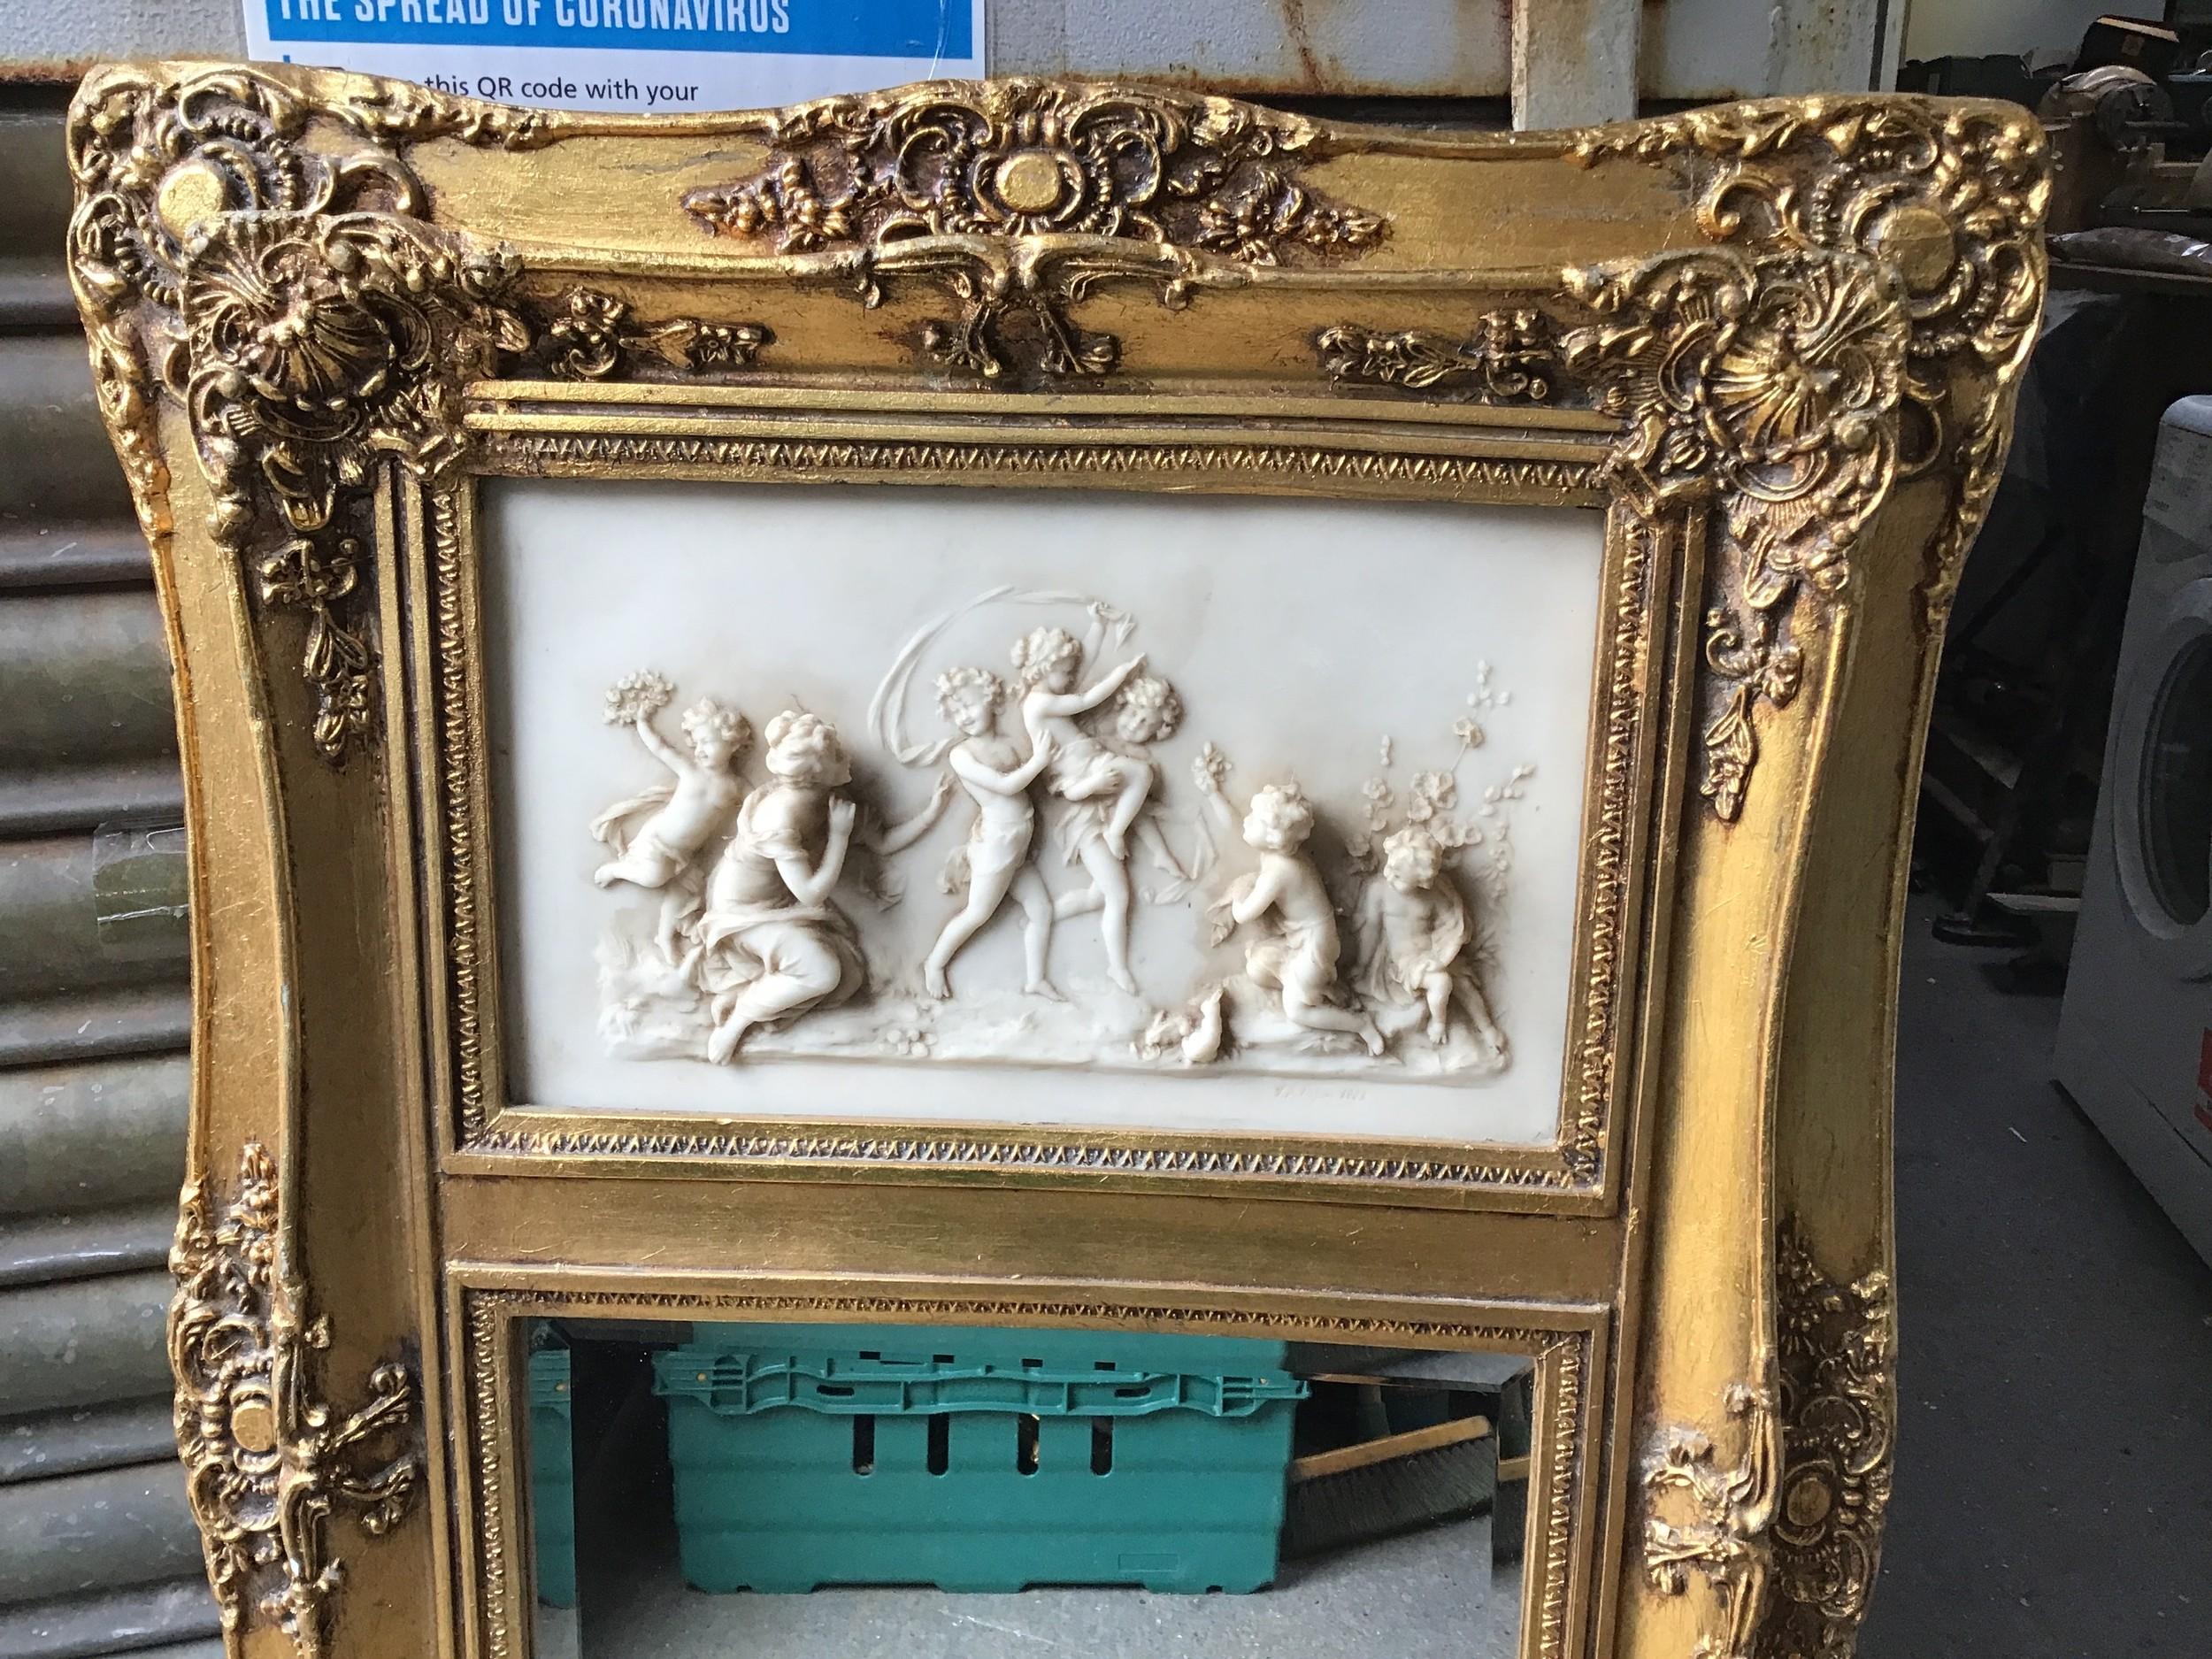 Vintage Gilt Ornately Framed Mirror - 52cm W x 108cm H - Image 2 of 2